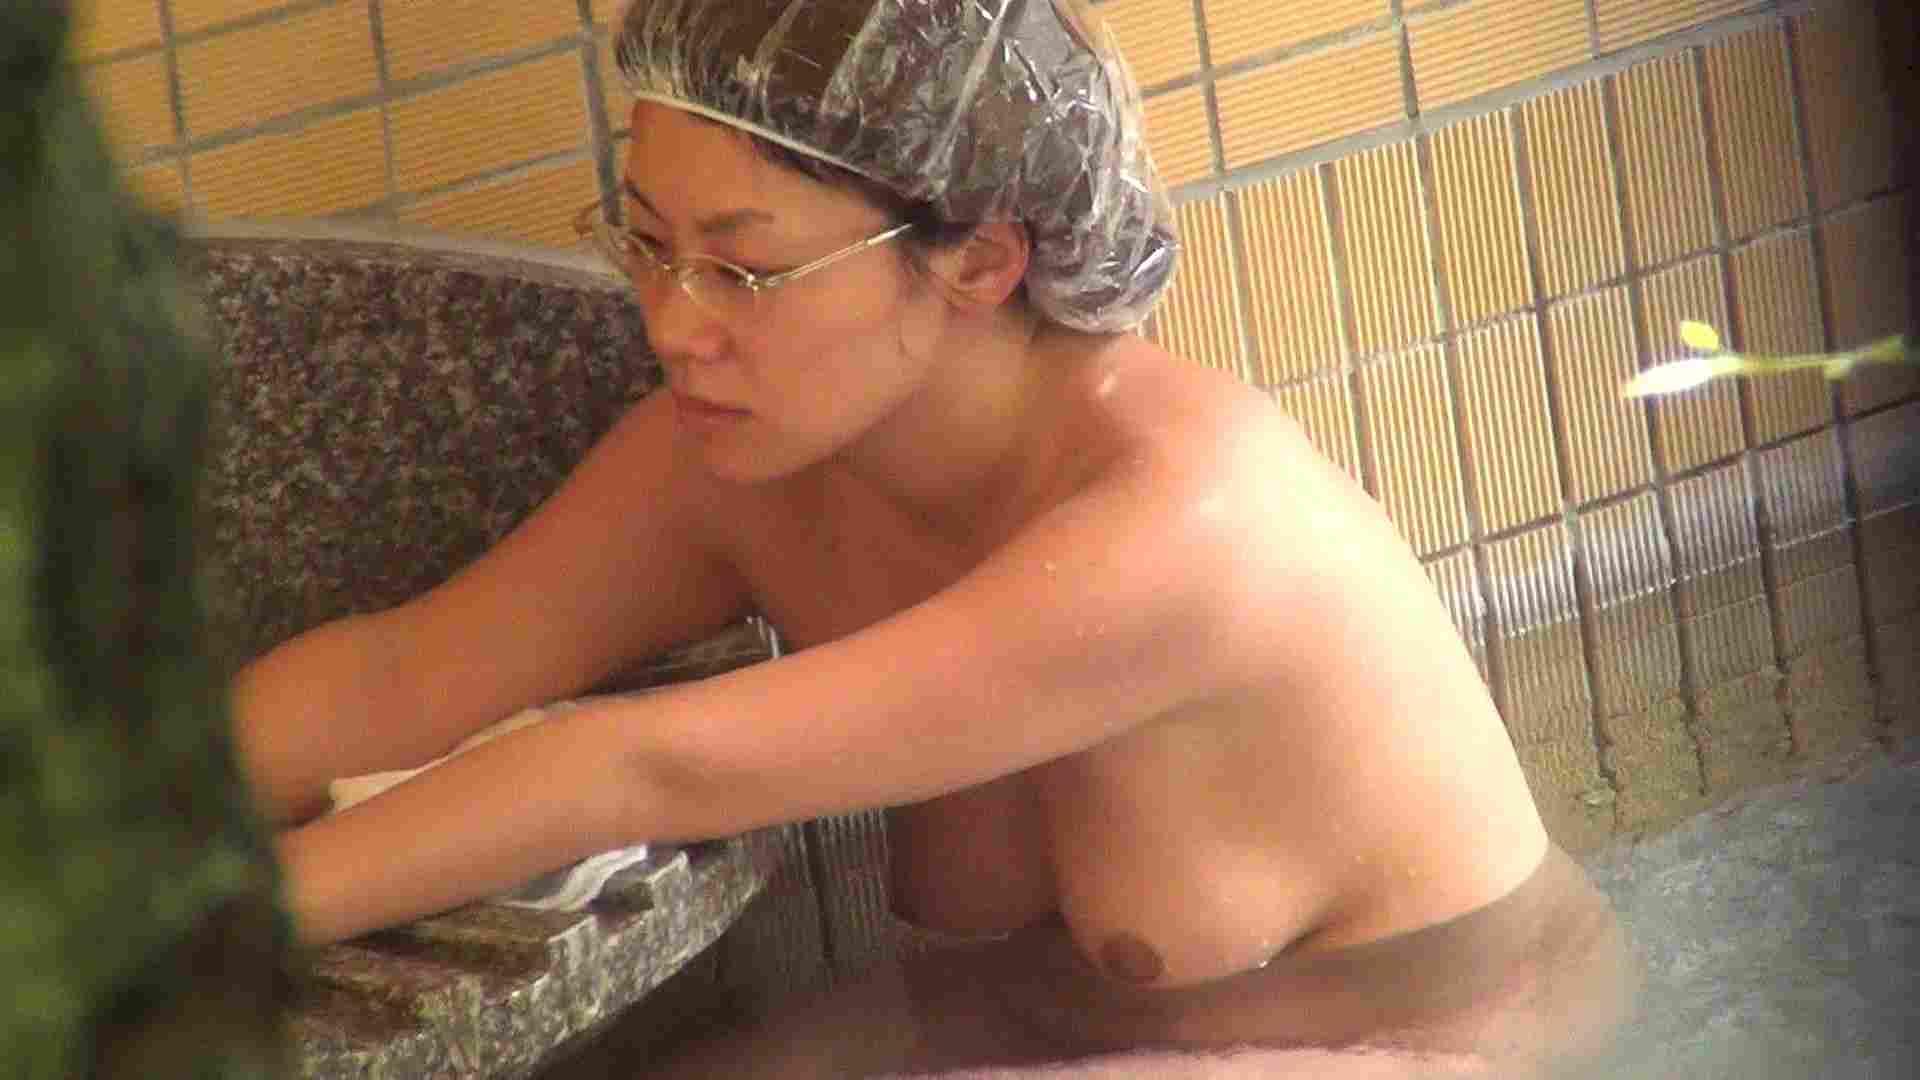 Aquaな露天風呂Vol.280 OLセックス | 盗撮  91画像 16